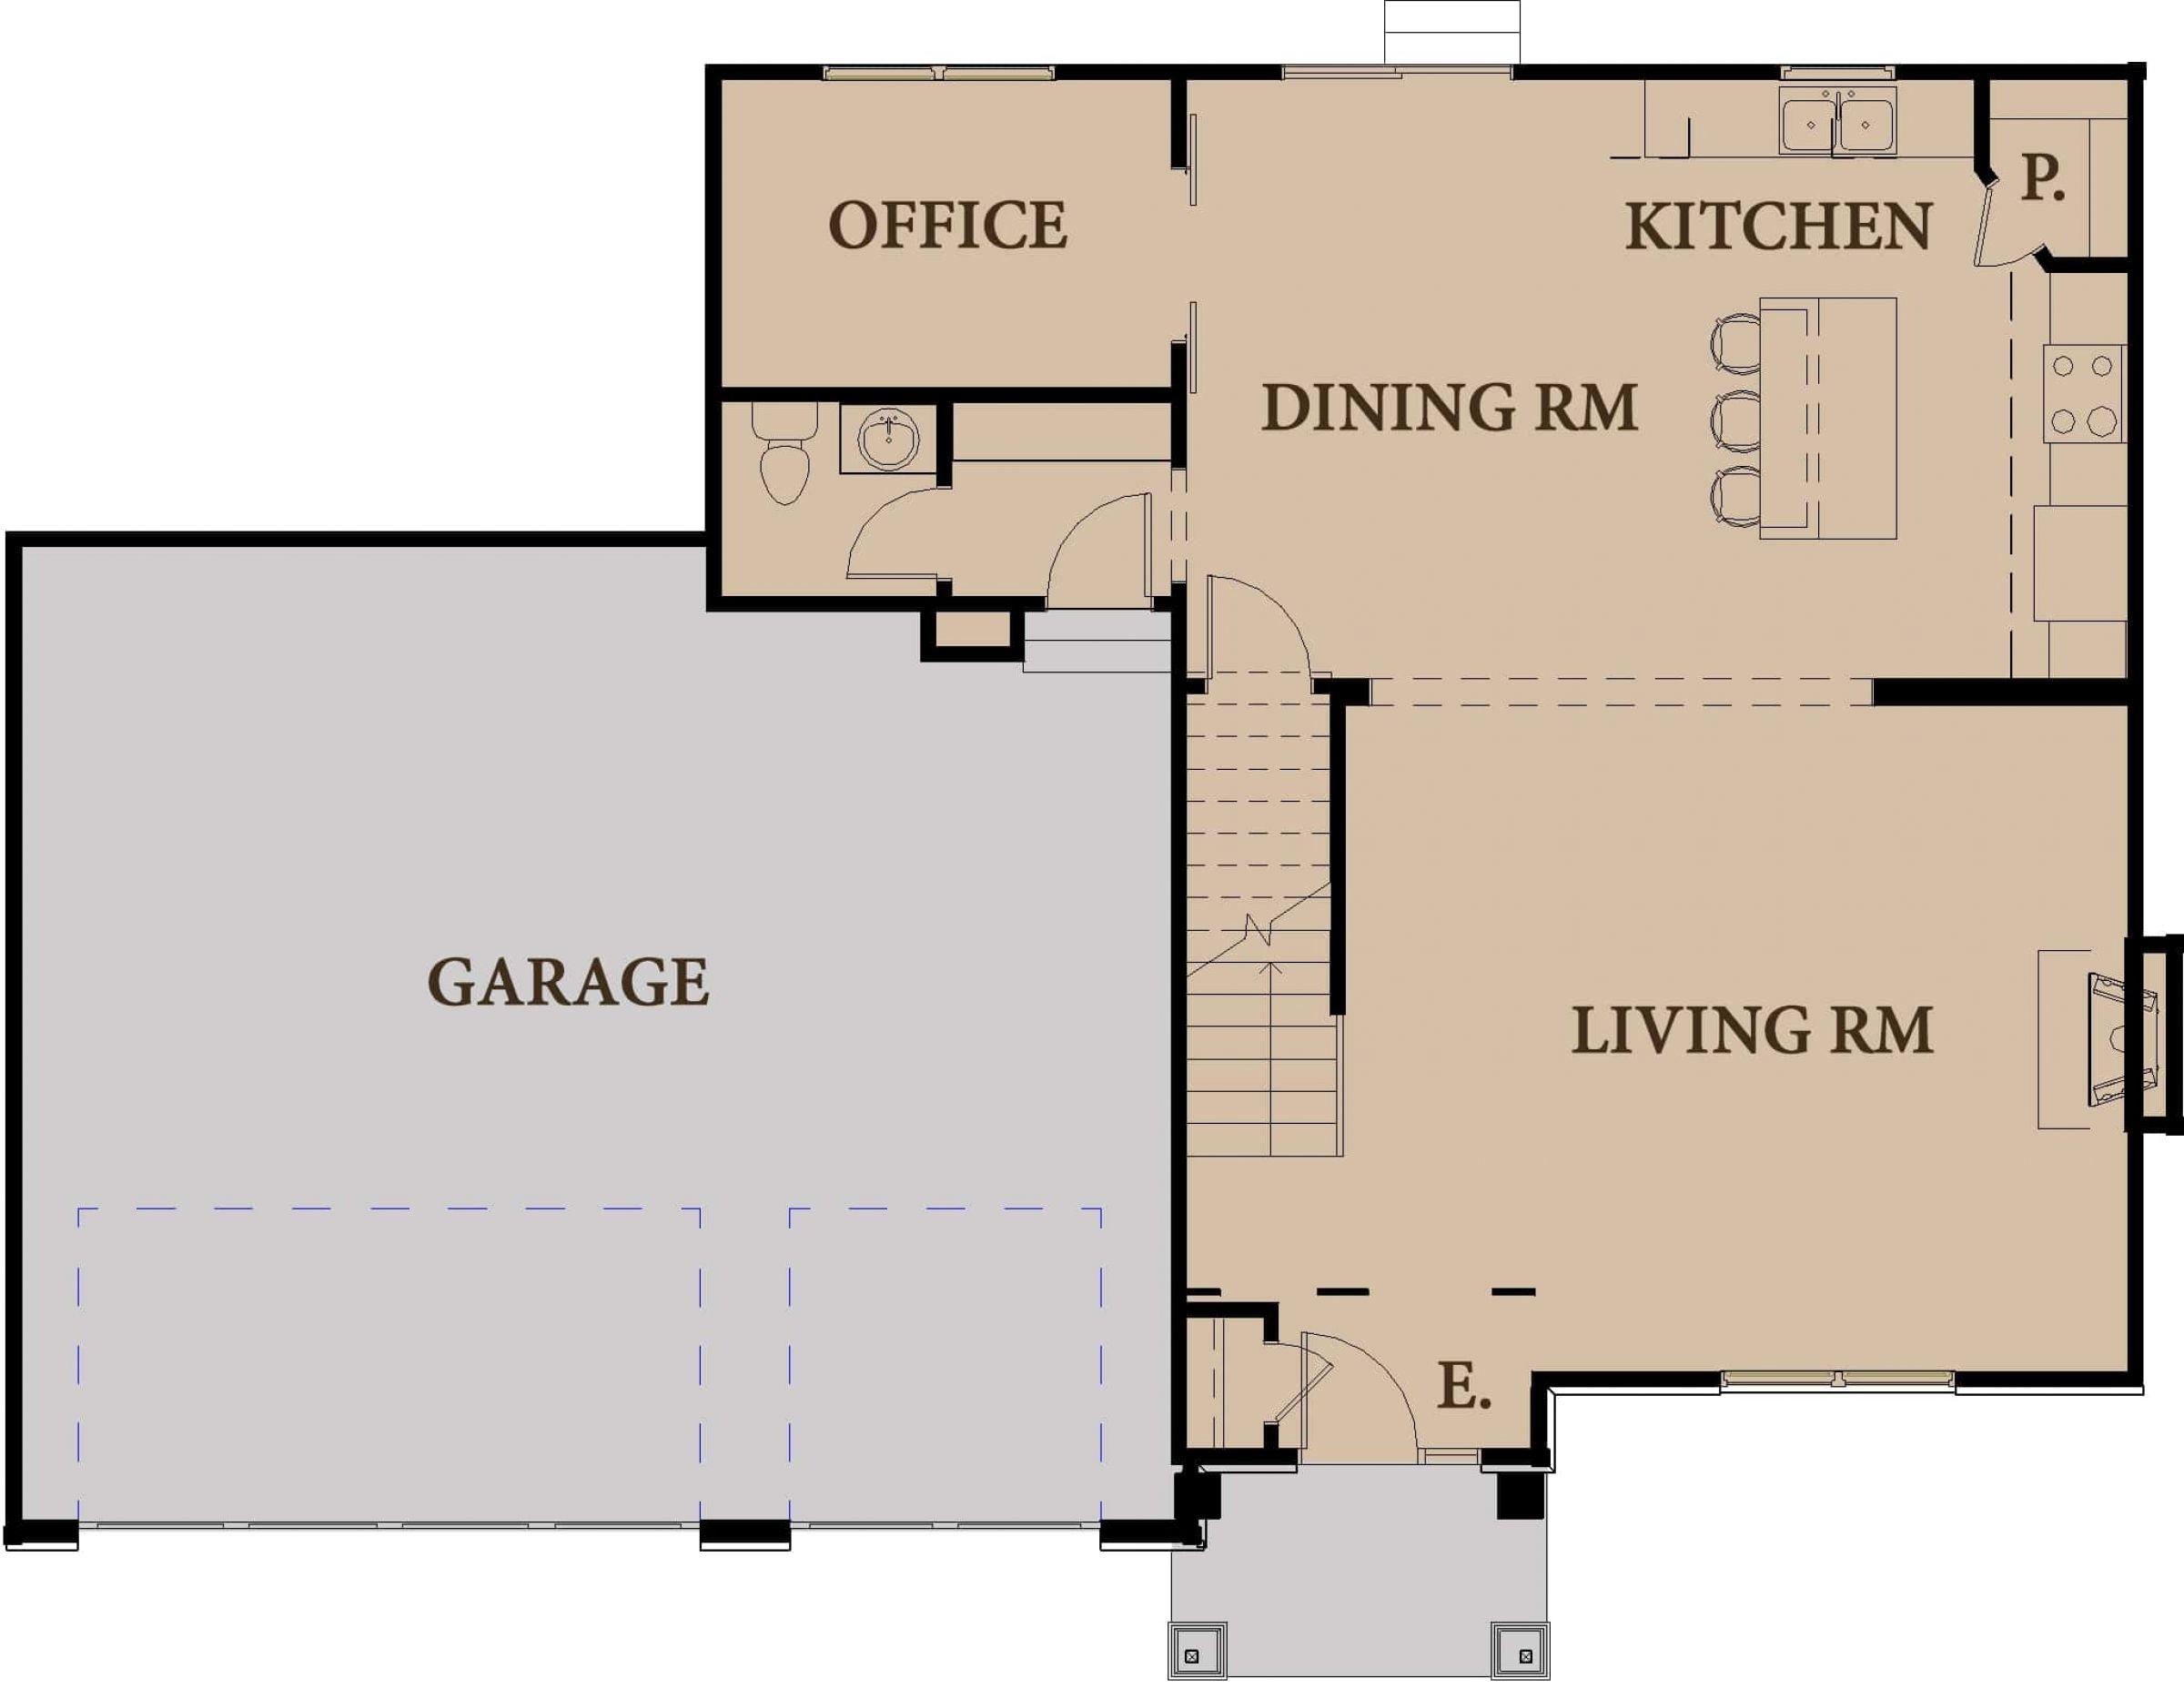 residential-warren-county-iowa-1-acres-listing-number-15672-0-2021-08-05-224731.jpg